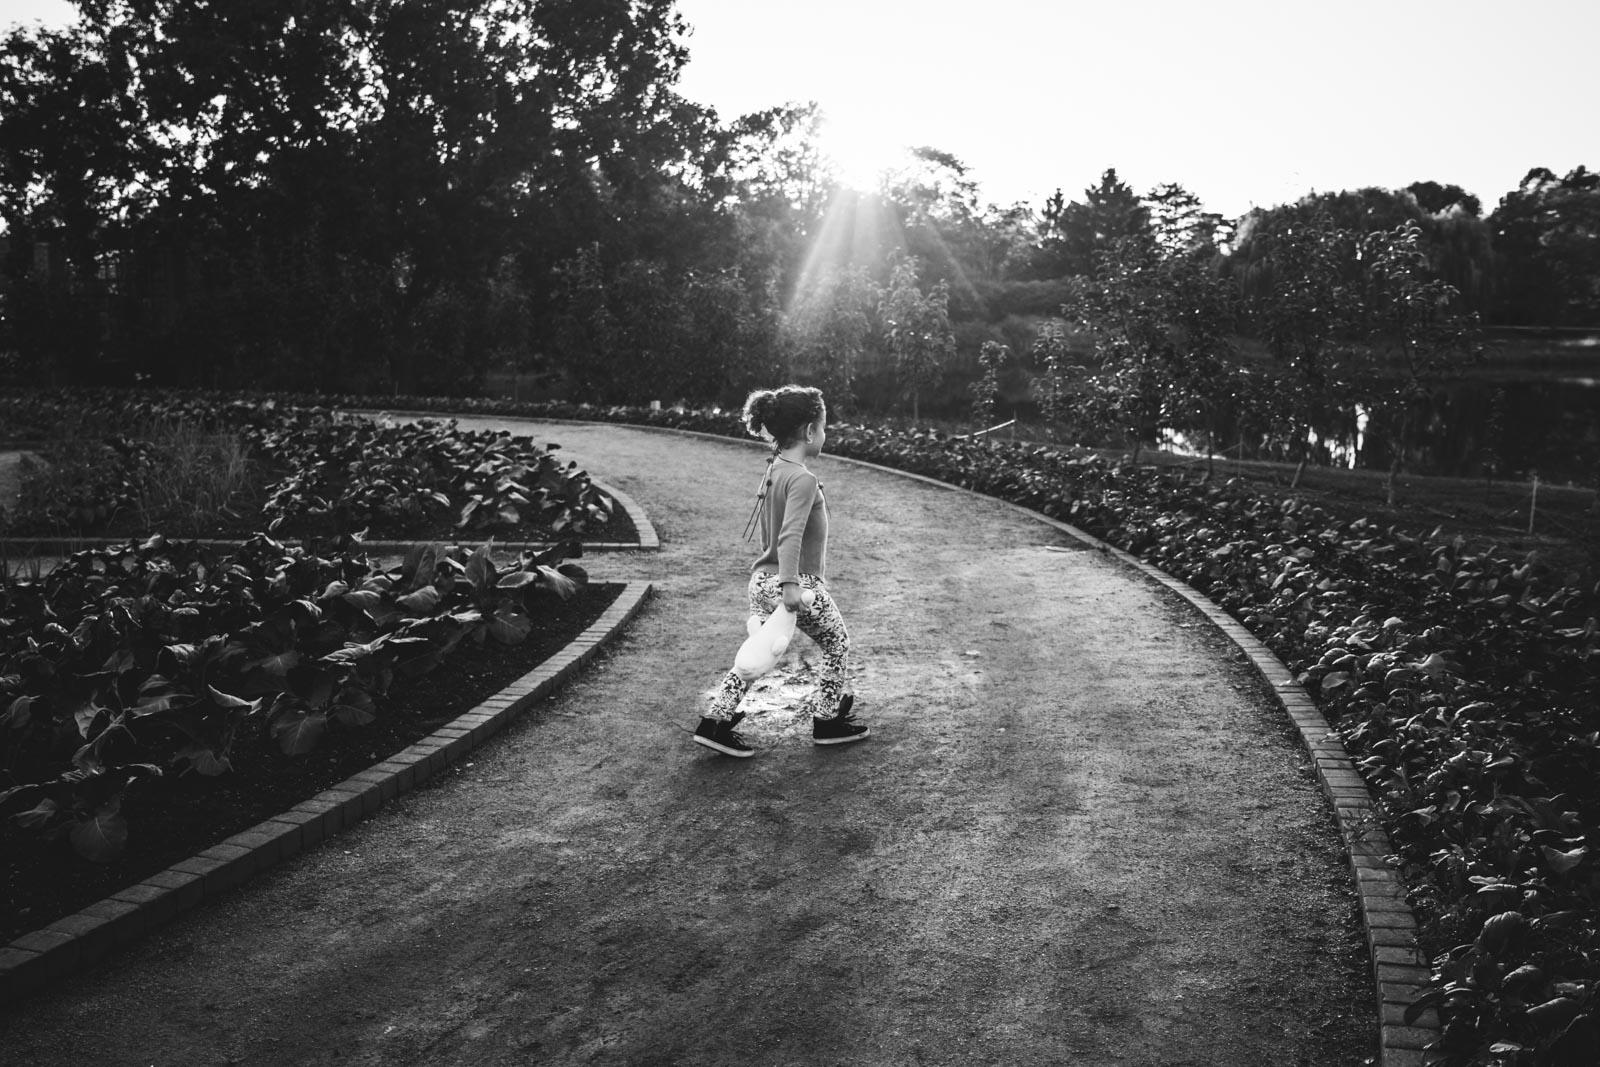 girl at sunset. Alicia Mayorca Photography | Chicago Couple + Maternity + Family Photographer.jpg